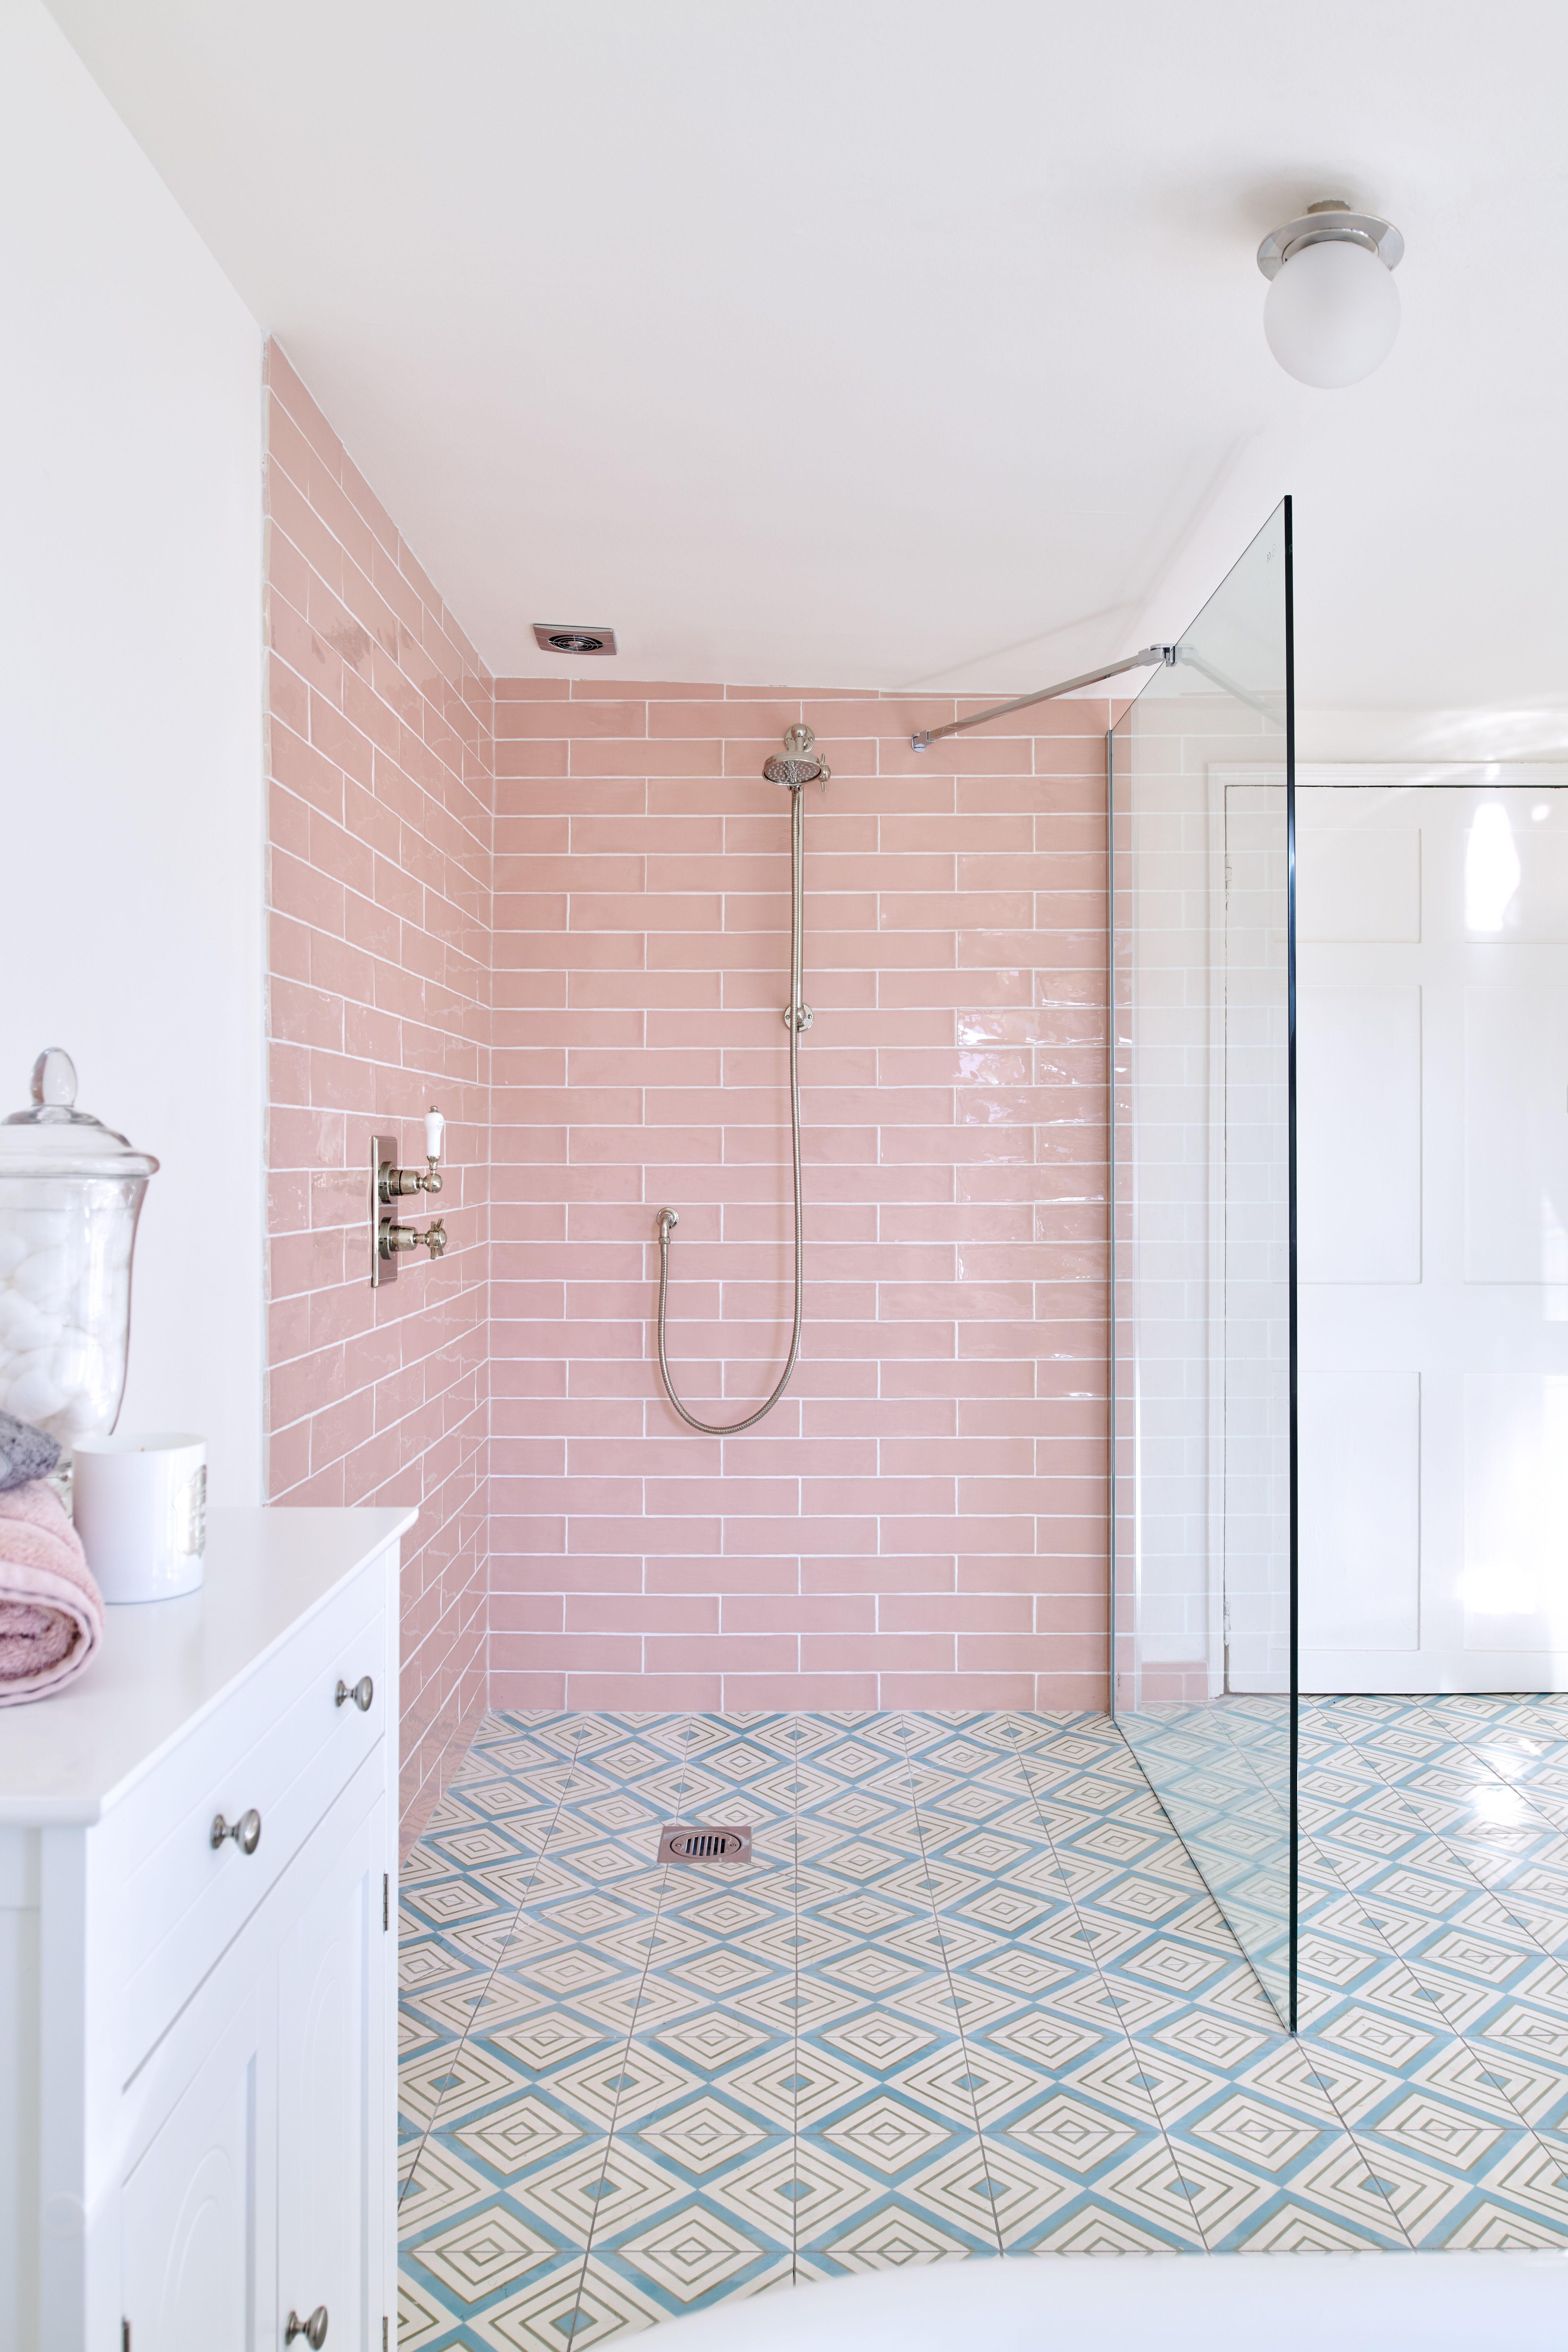 Carter Rose Ceramic Tiles | Ca' Pietra